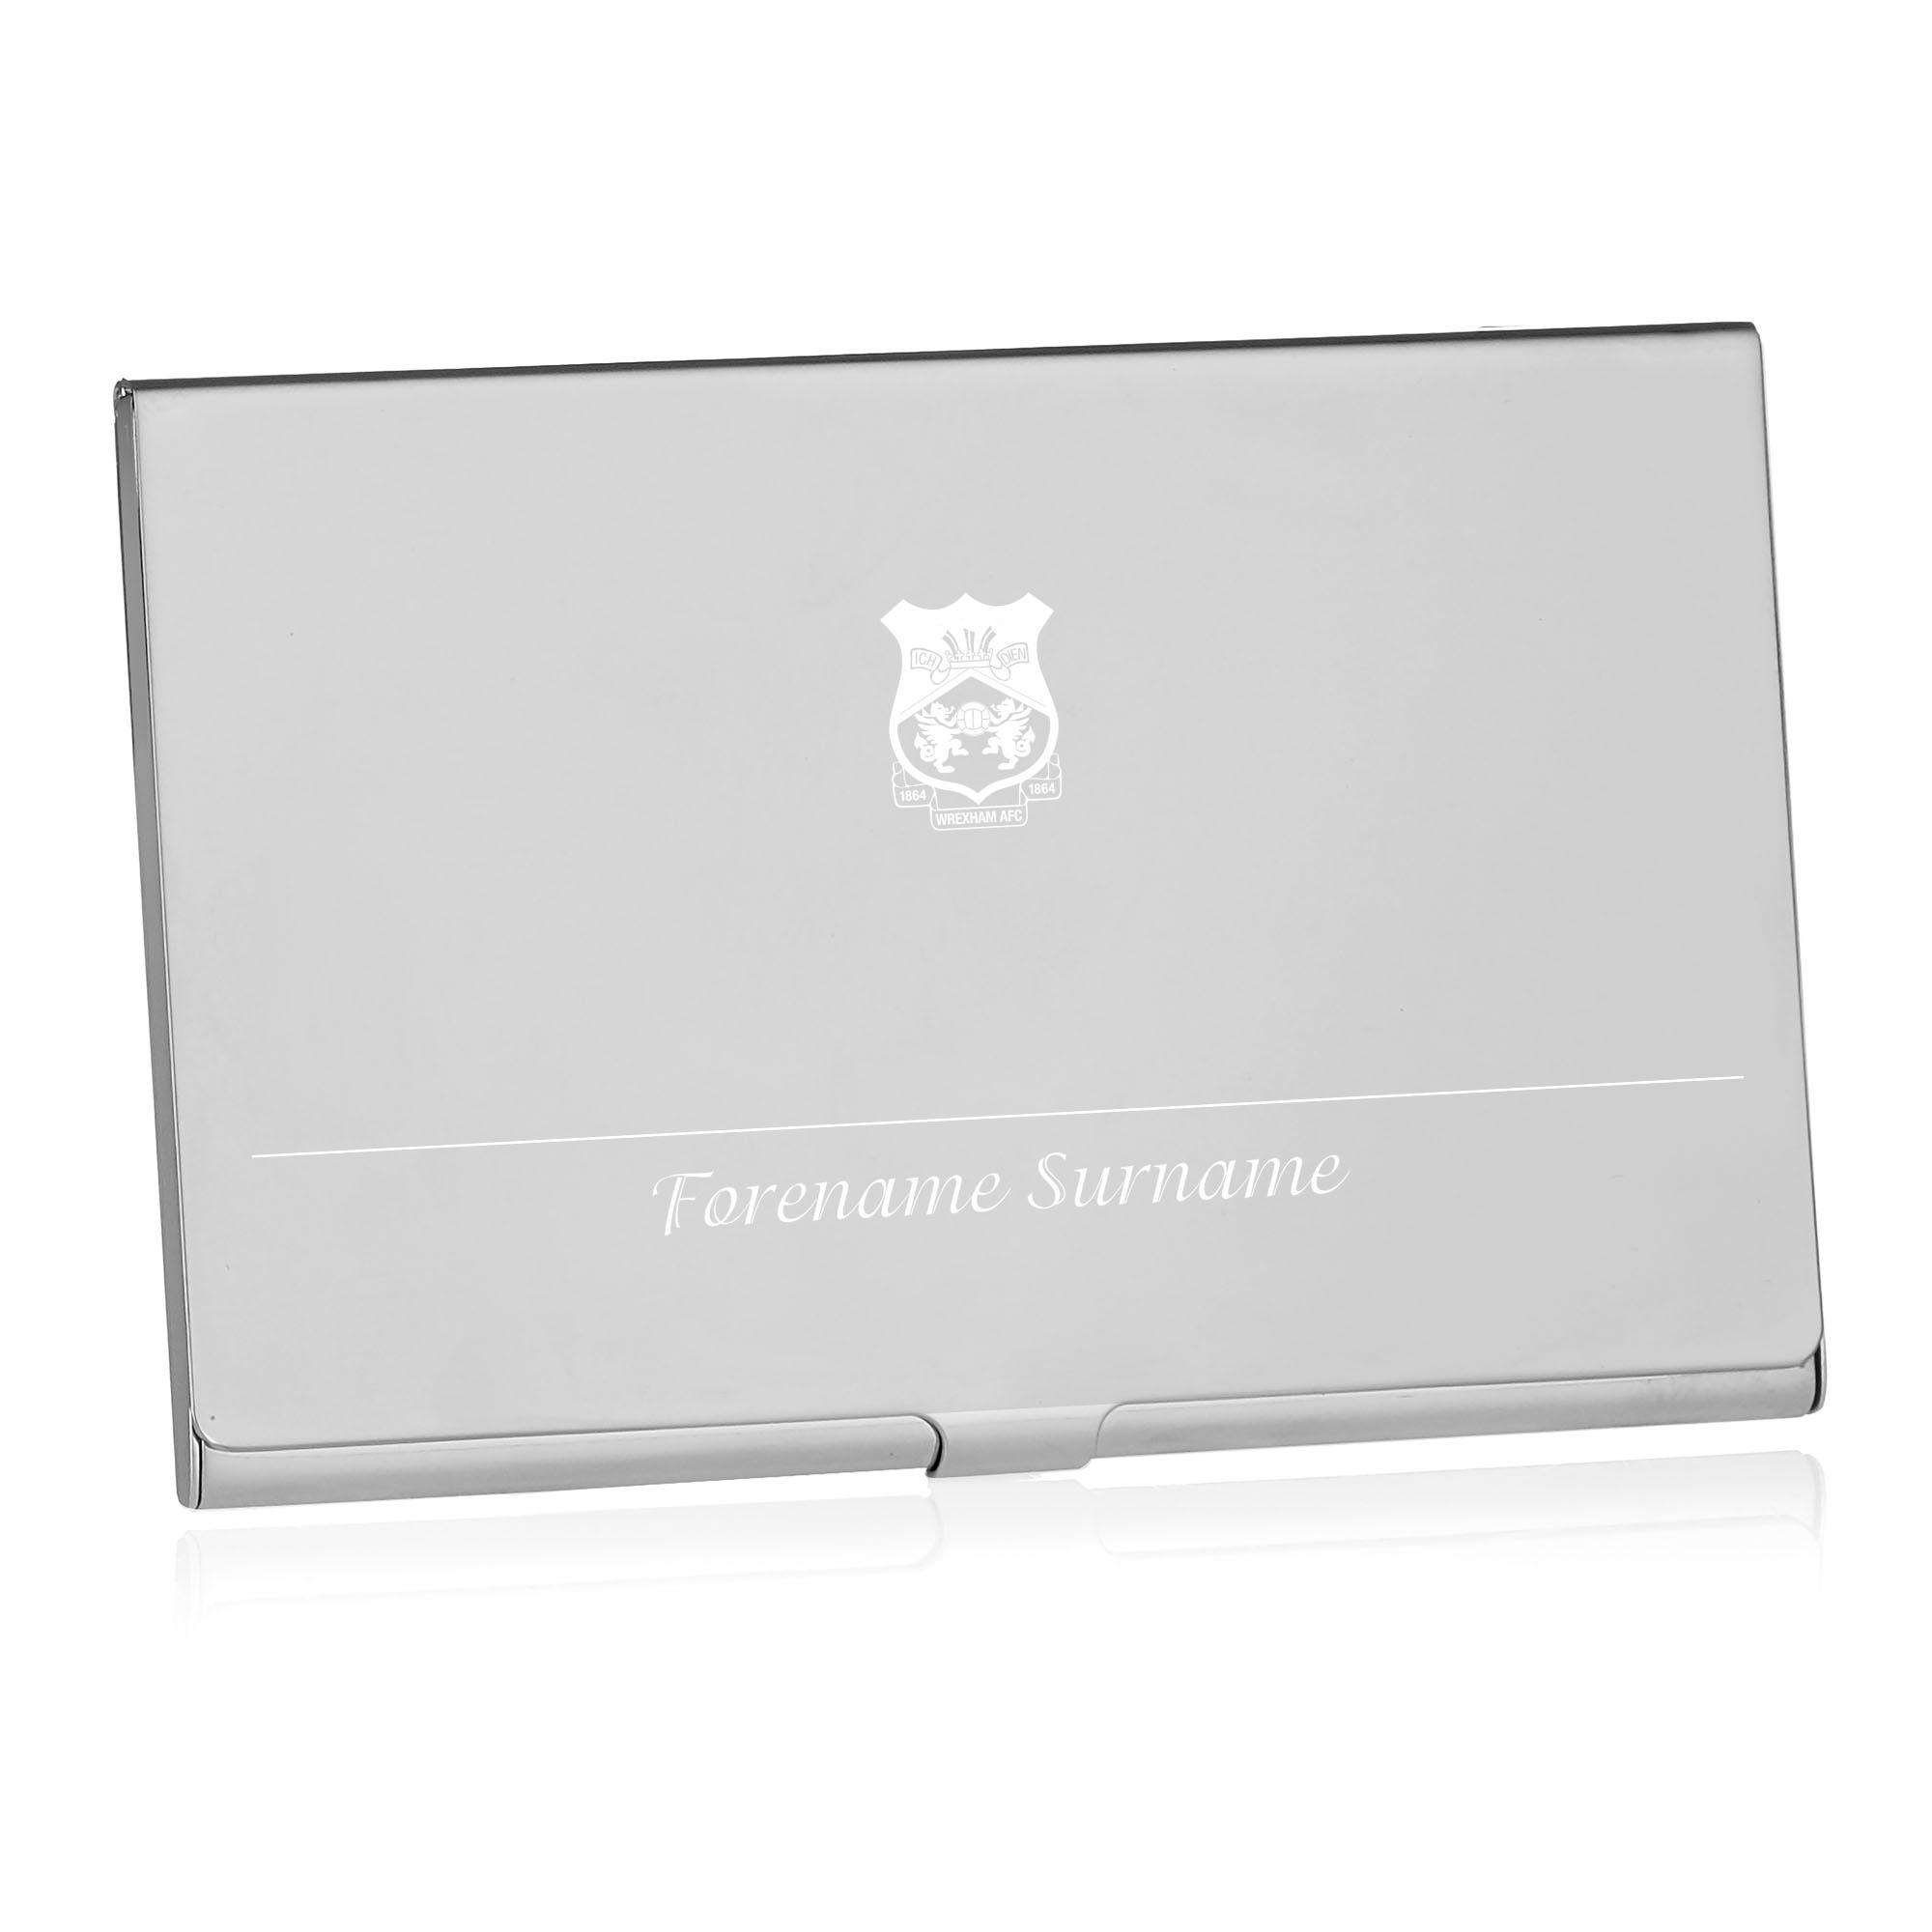 Wrexham AFC Executive Business Card Holder